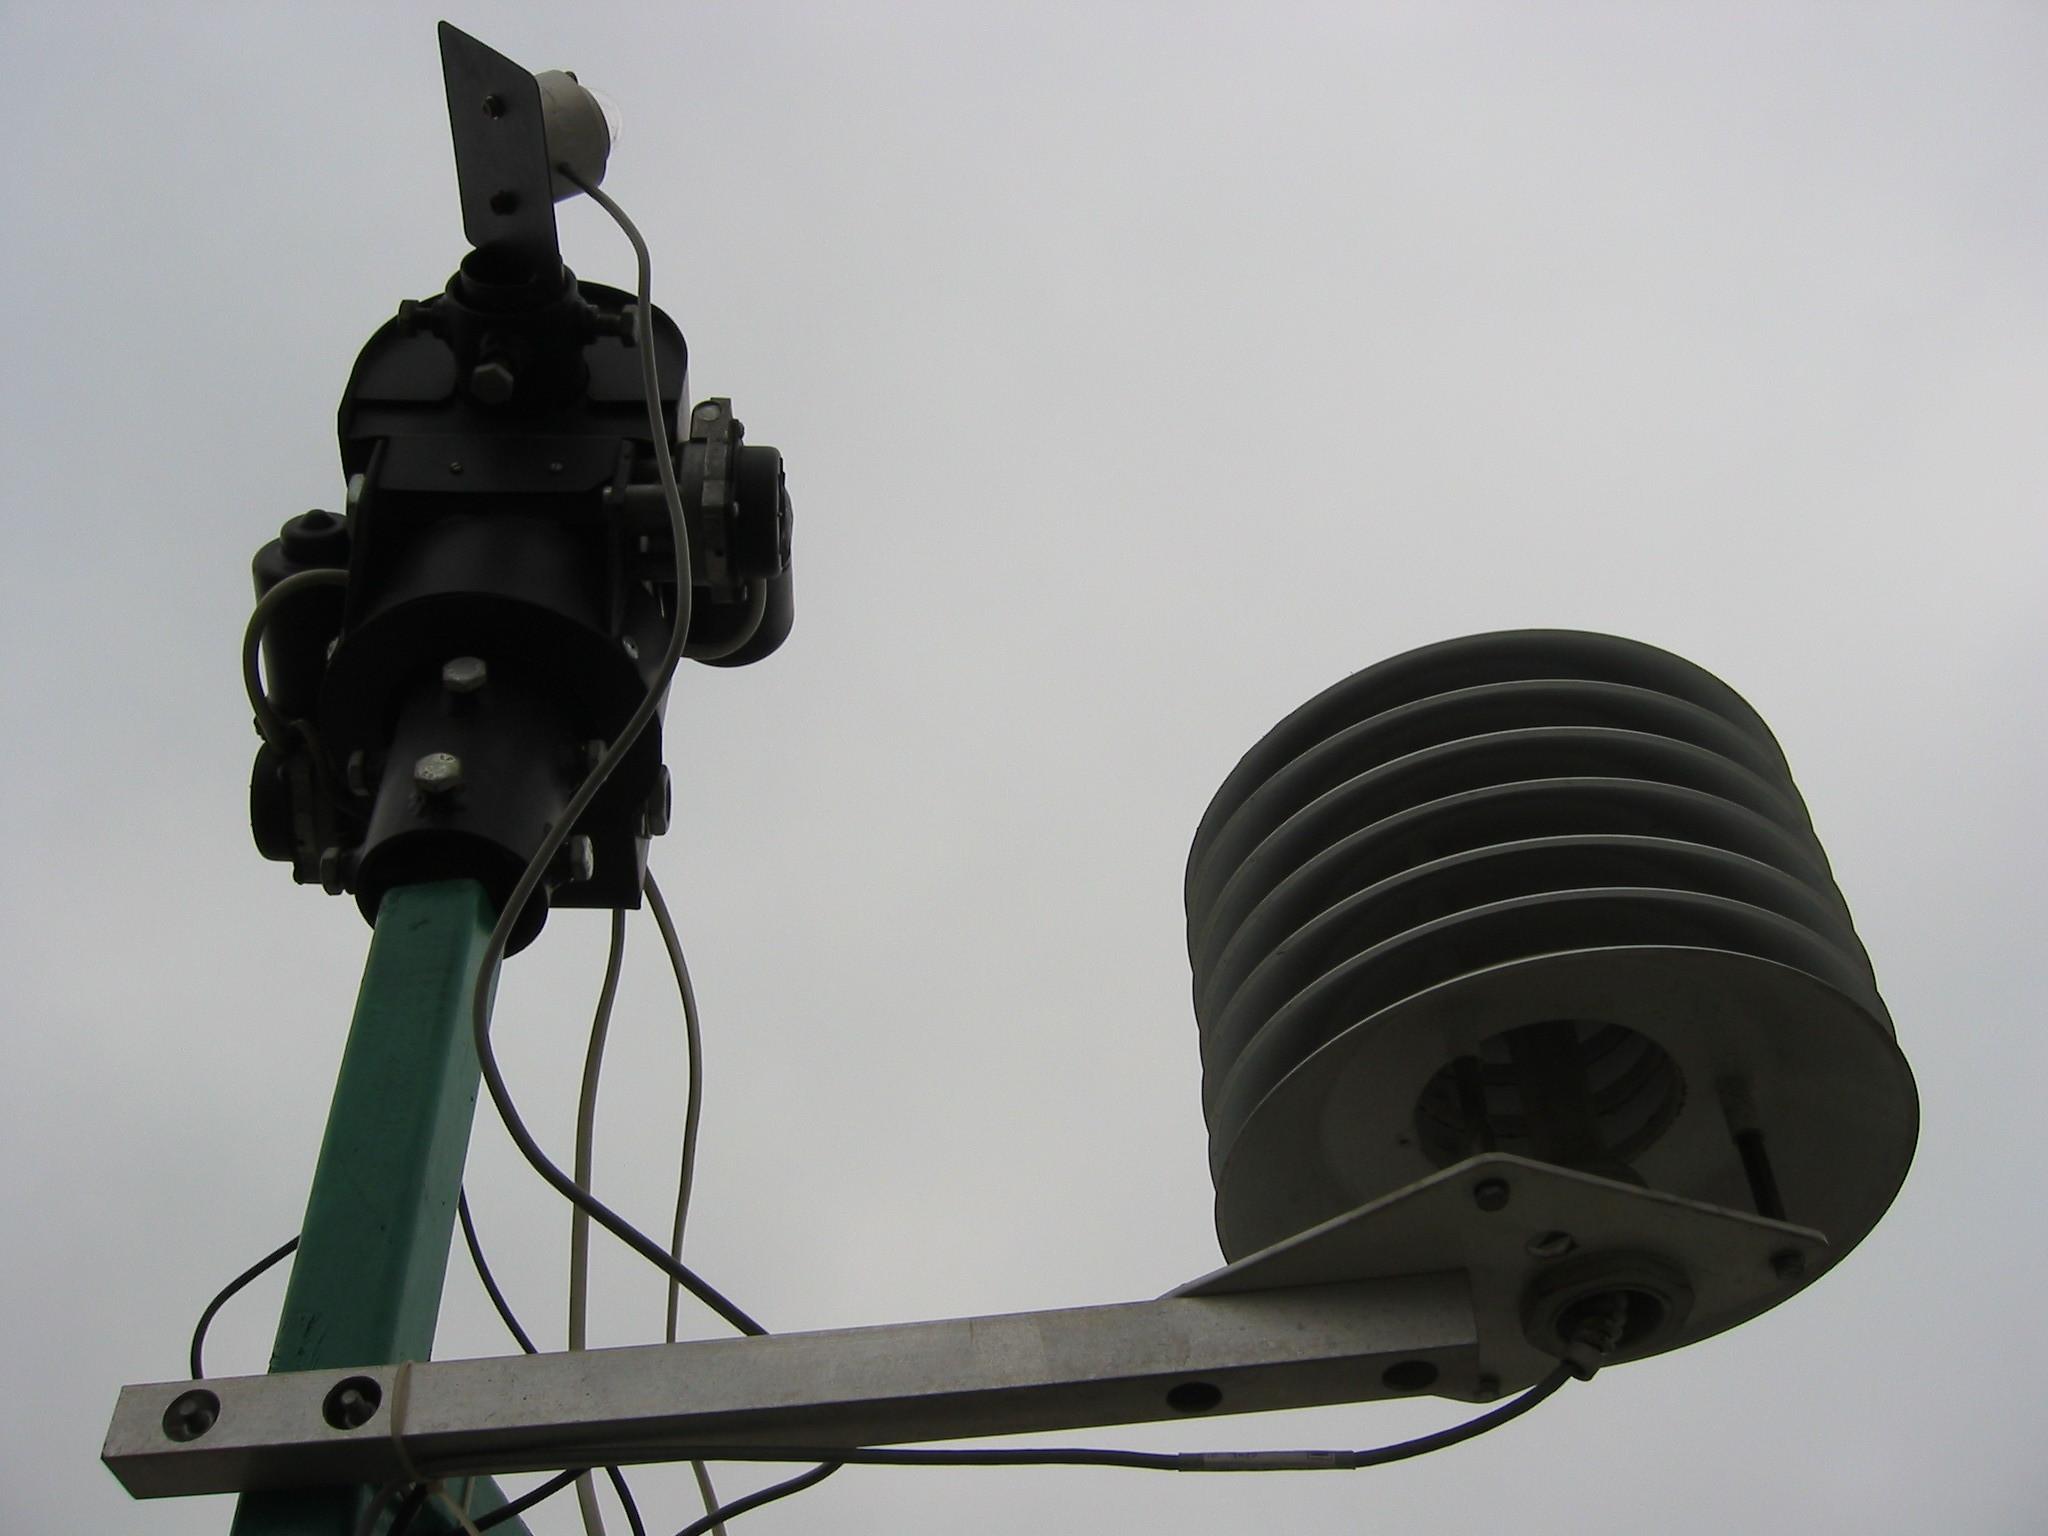 Stacja SGGW: klatka meteo z LB-710R